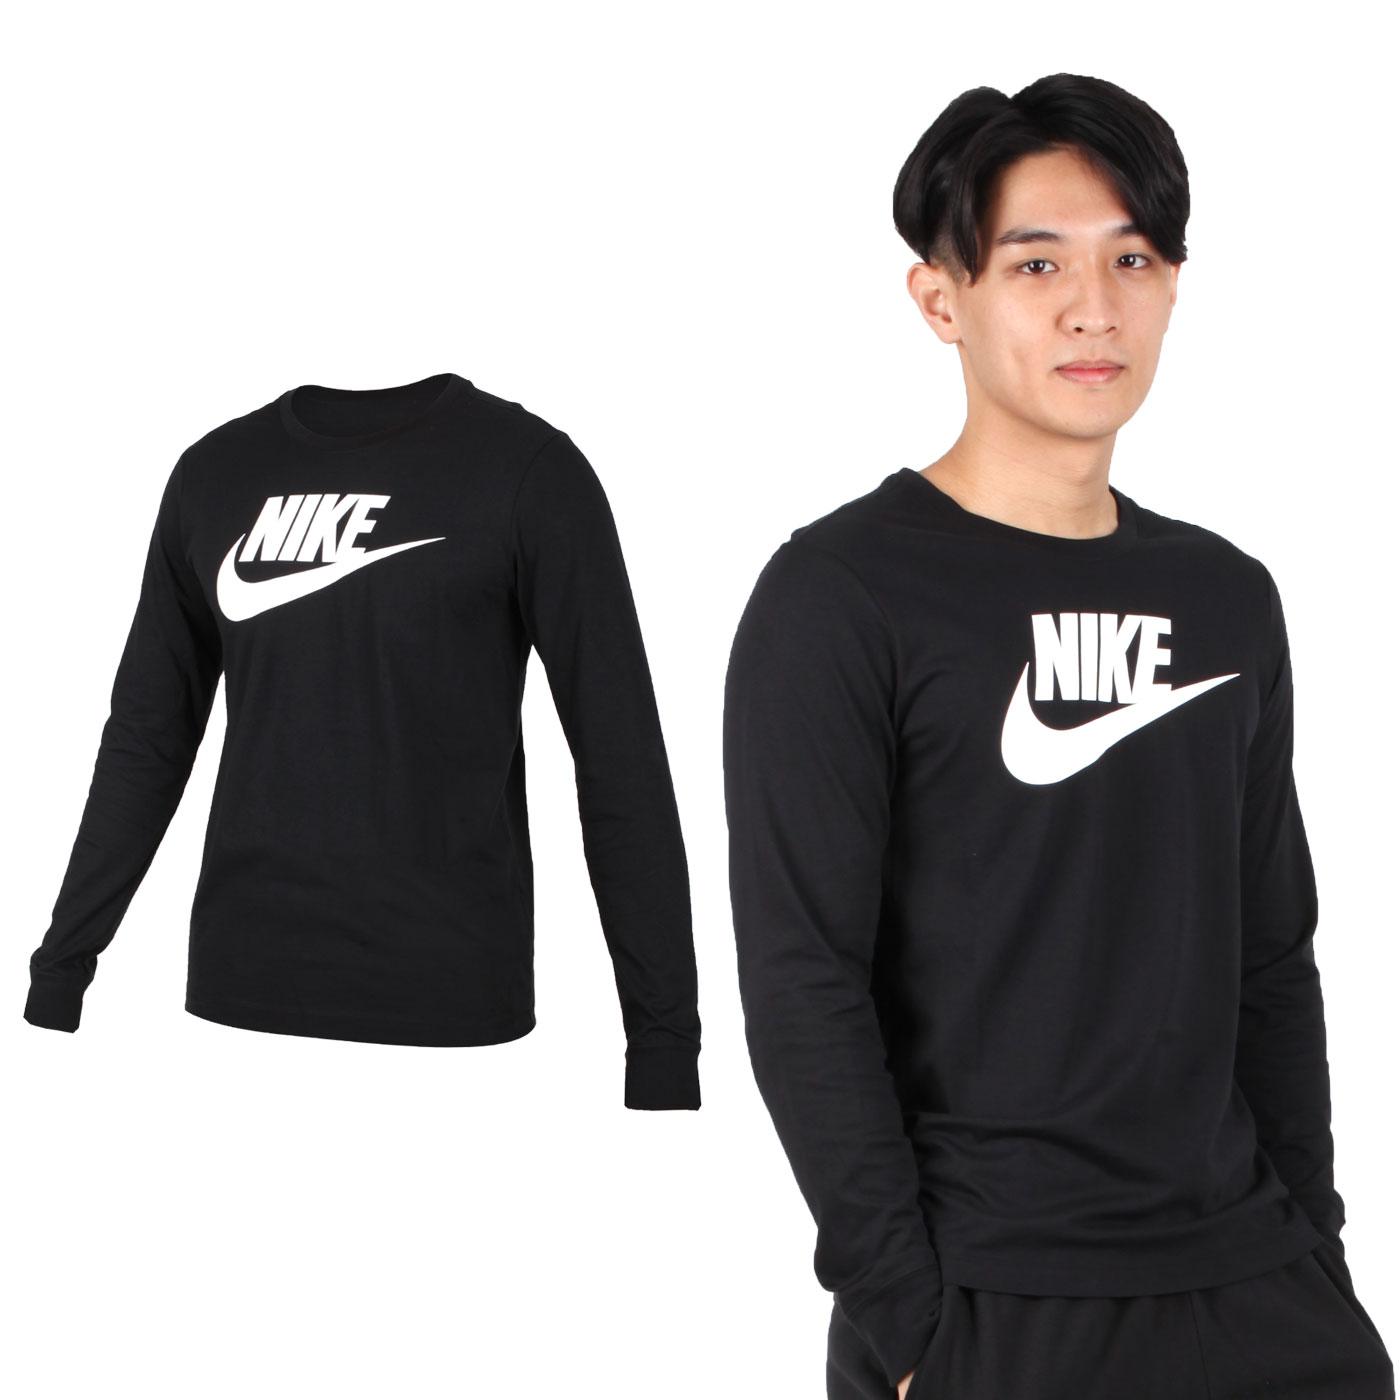 NIKE 男款薄長袖圓領T恤 CI6292-010 - 黑白